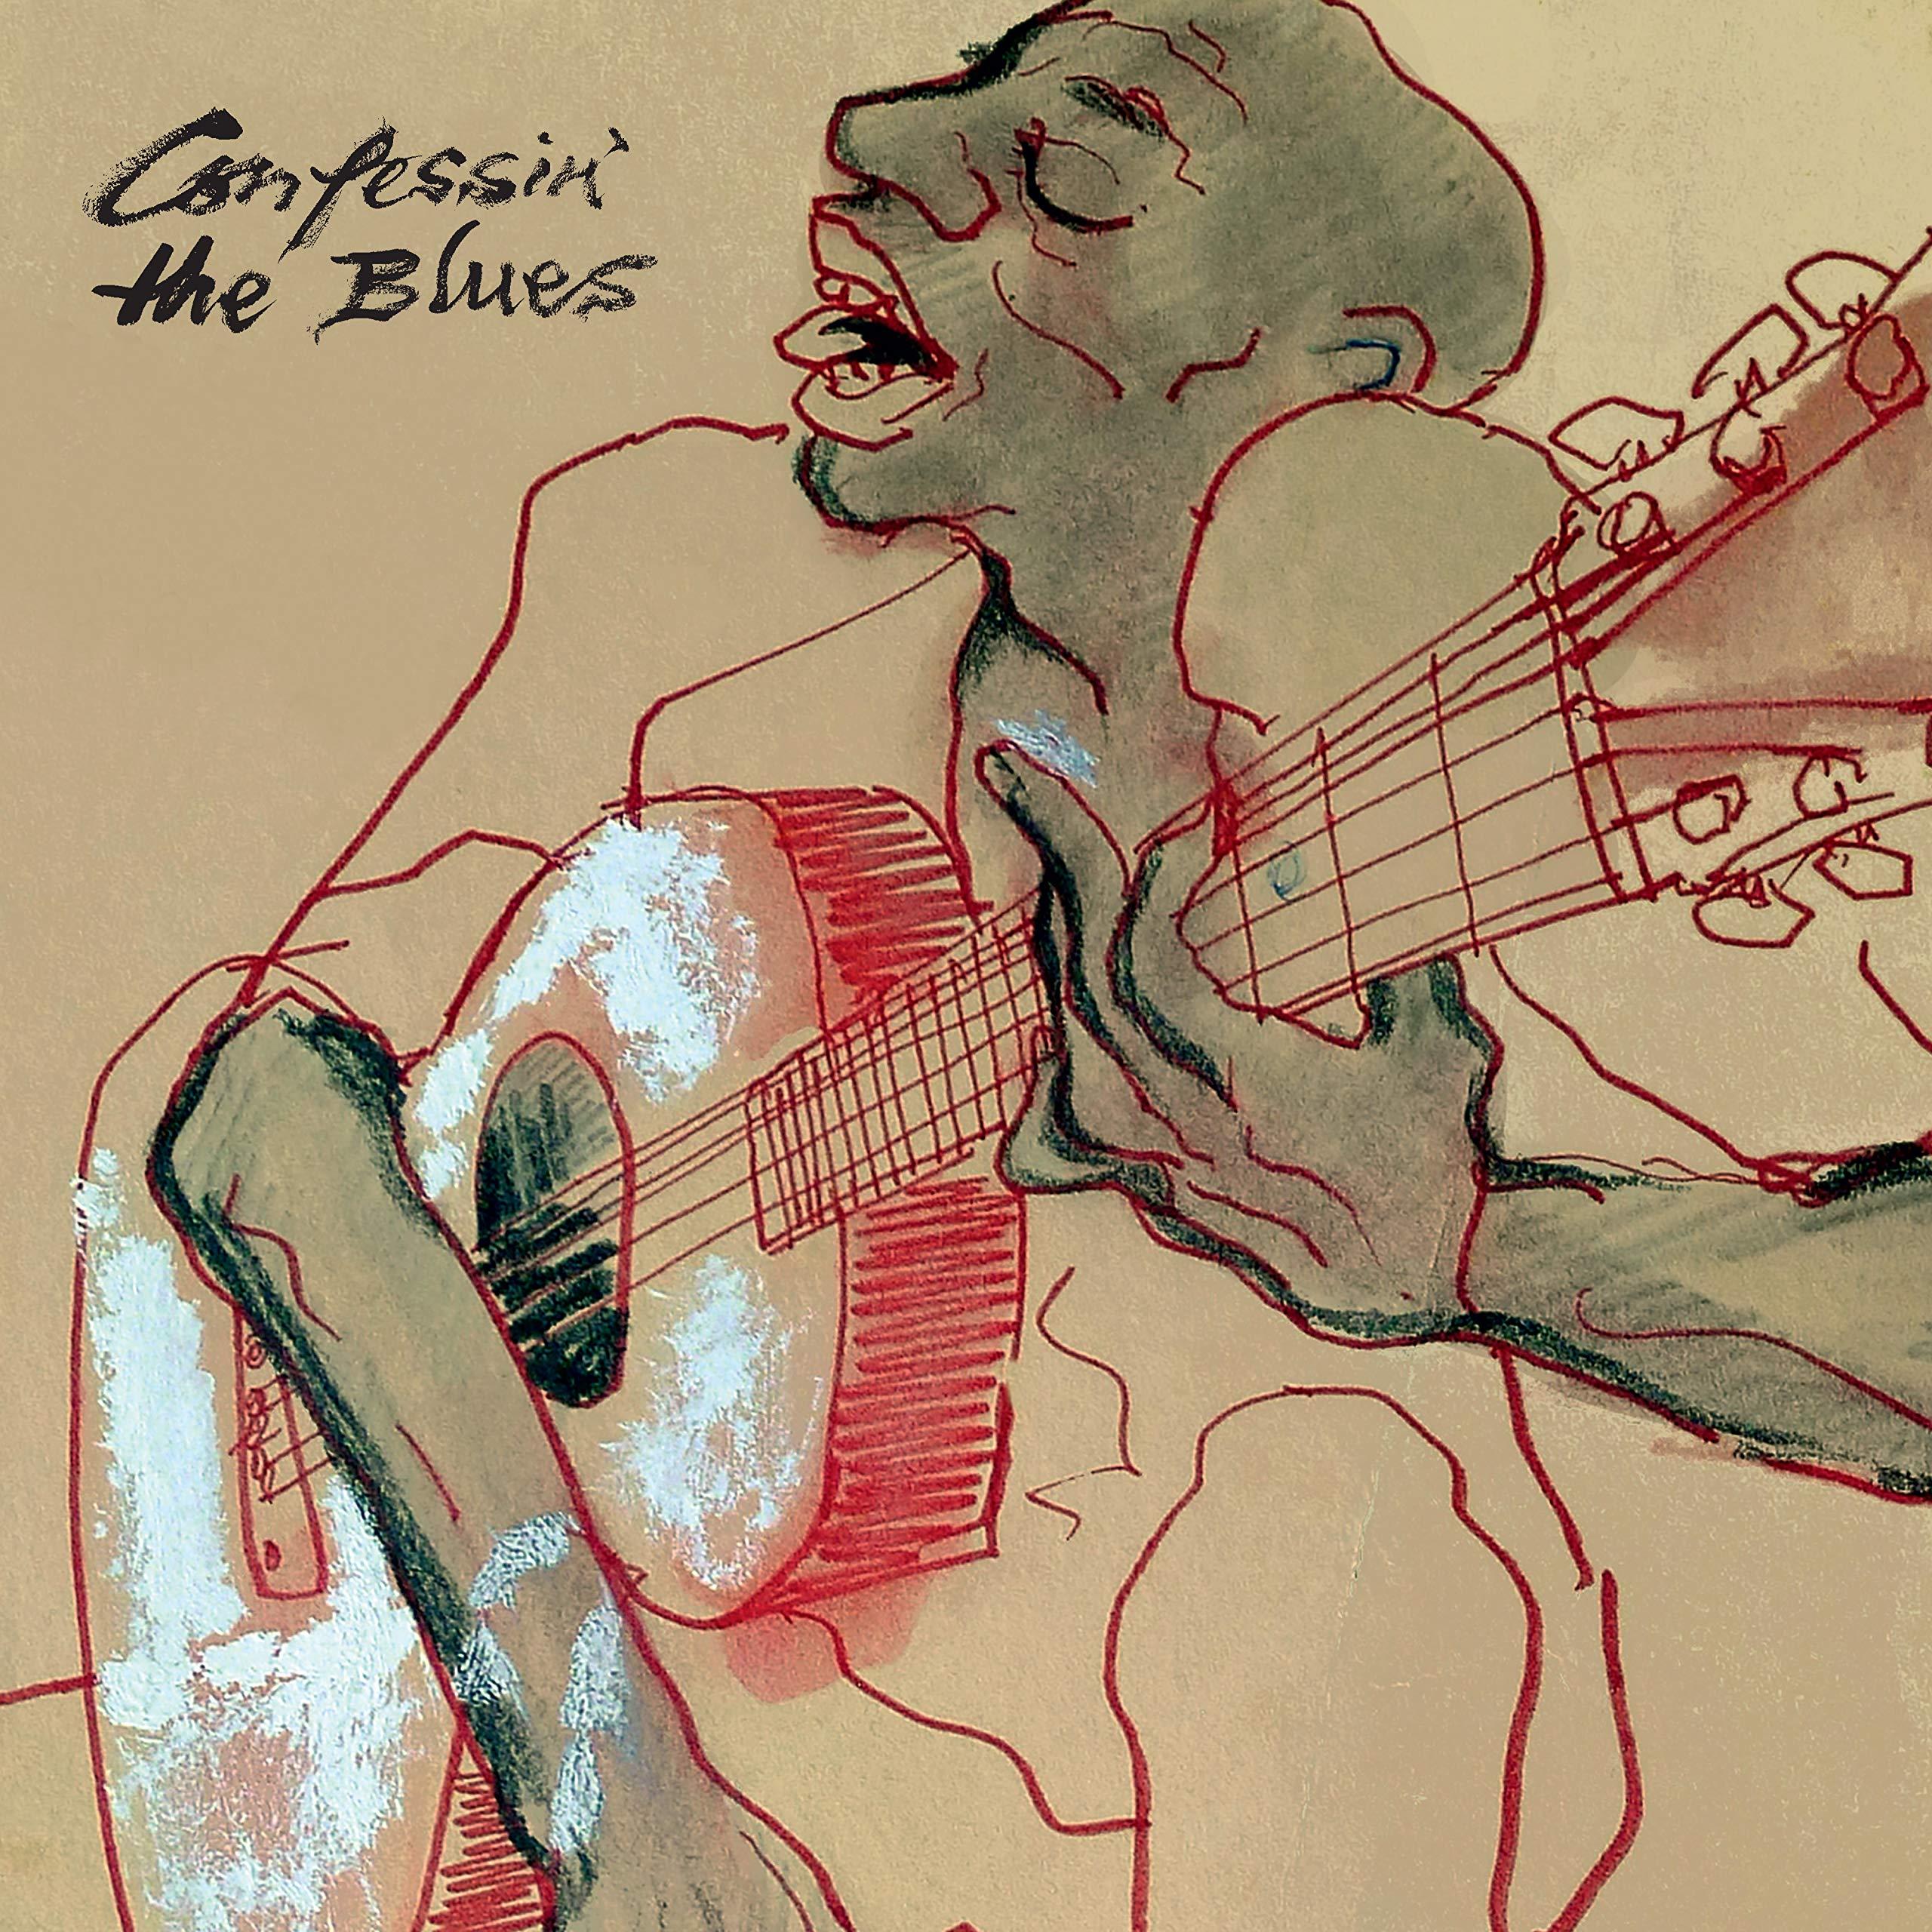 CD : Confessin' the Blues - Confessin' The Blues (CD)